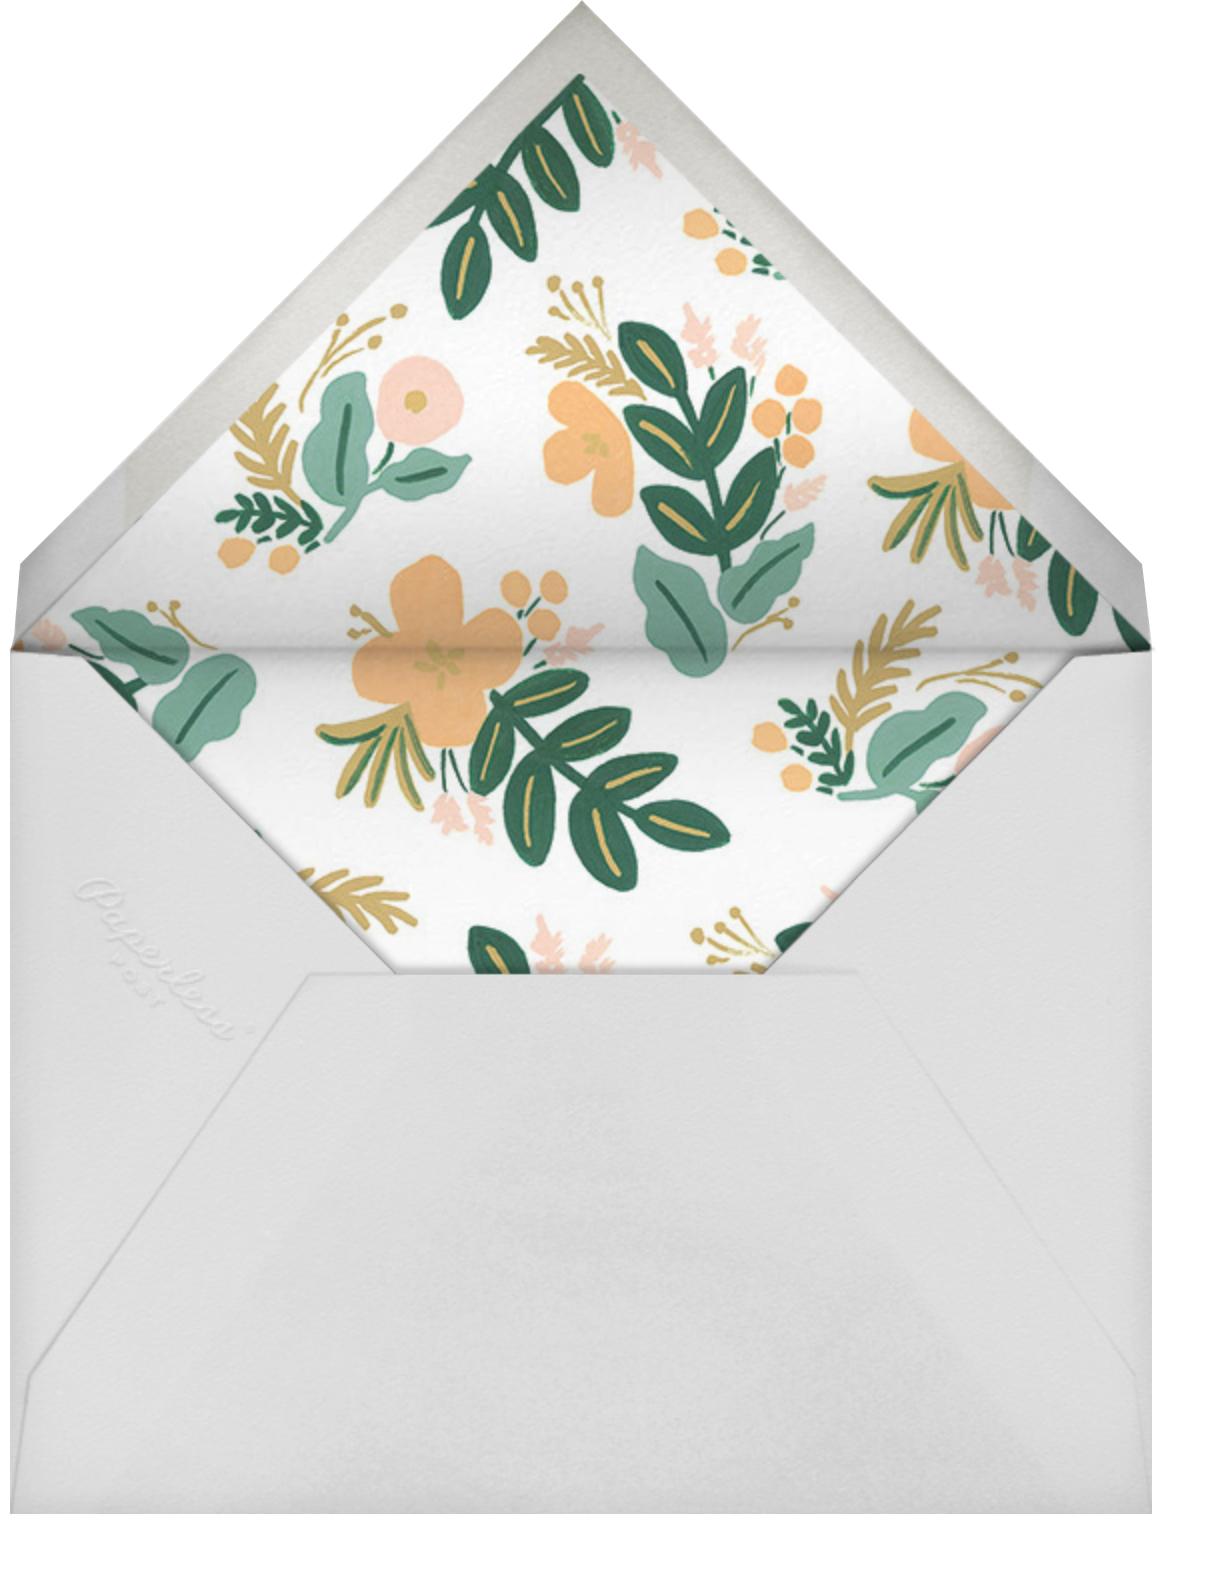 Festive Fauna - Rifle Paper Co. - Designs we love - envelope back